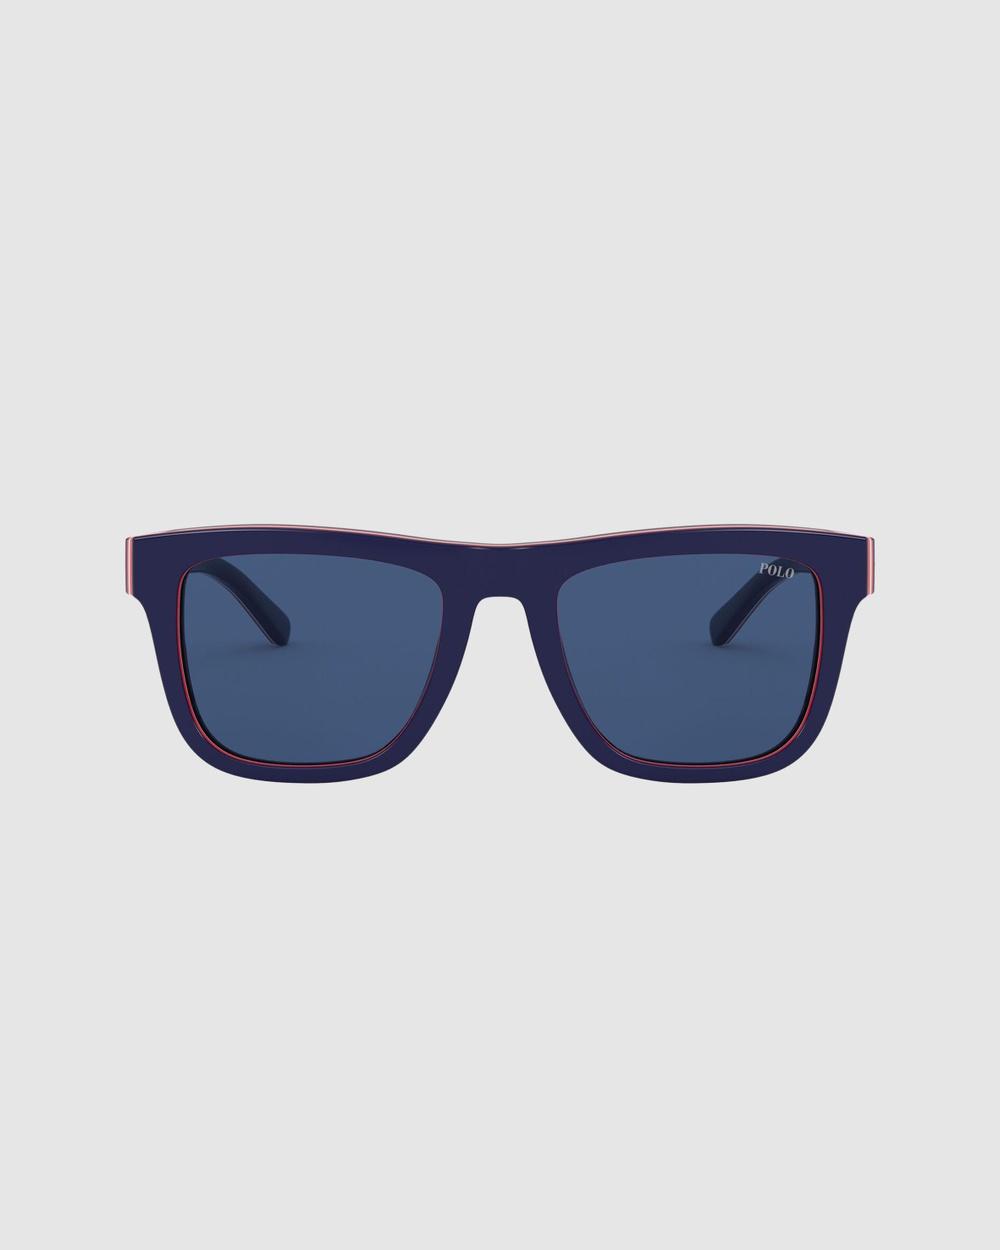 Polo Ralph Lauren 0PH4161 Square Blue